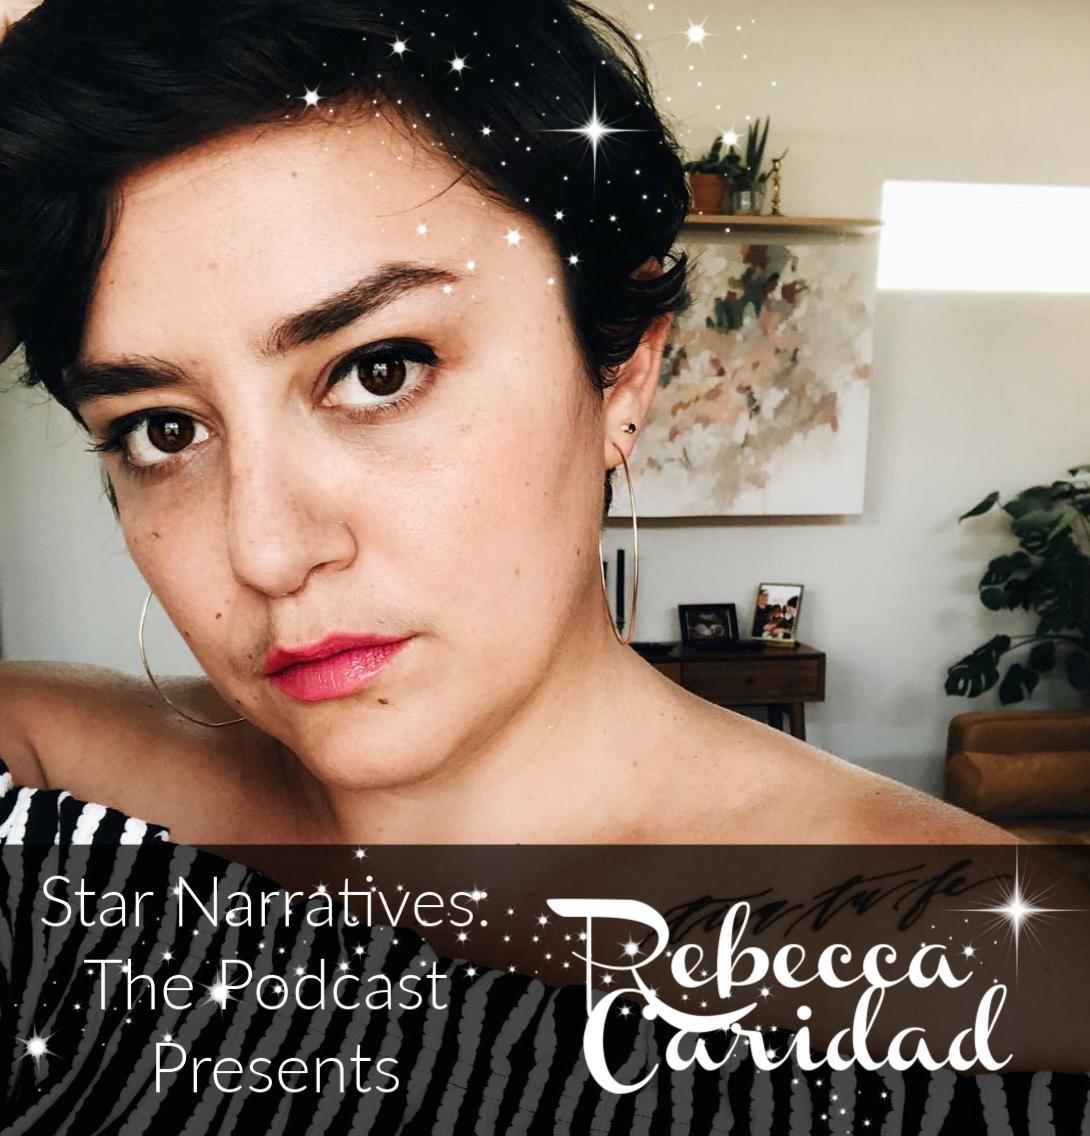 Rebecca Caridad_SN_promo.png